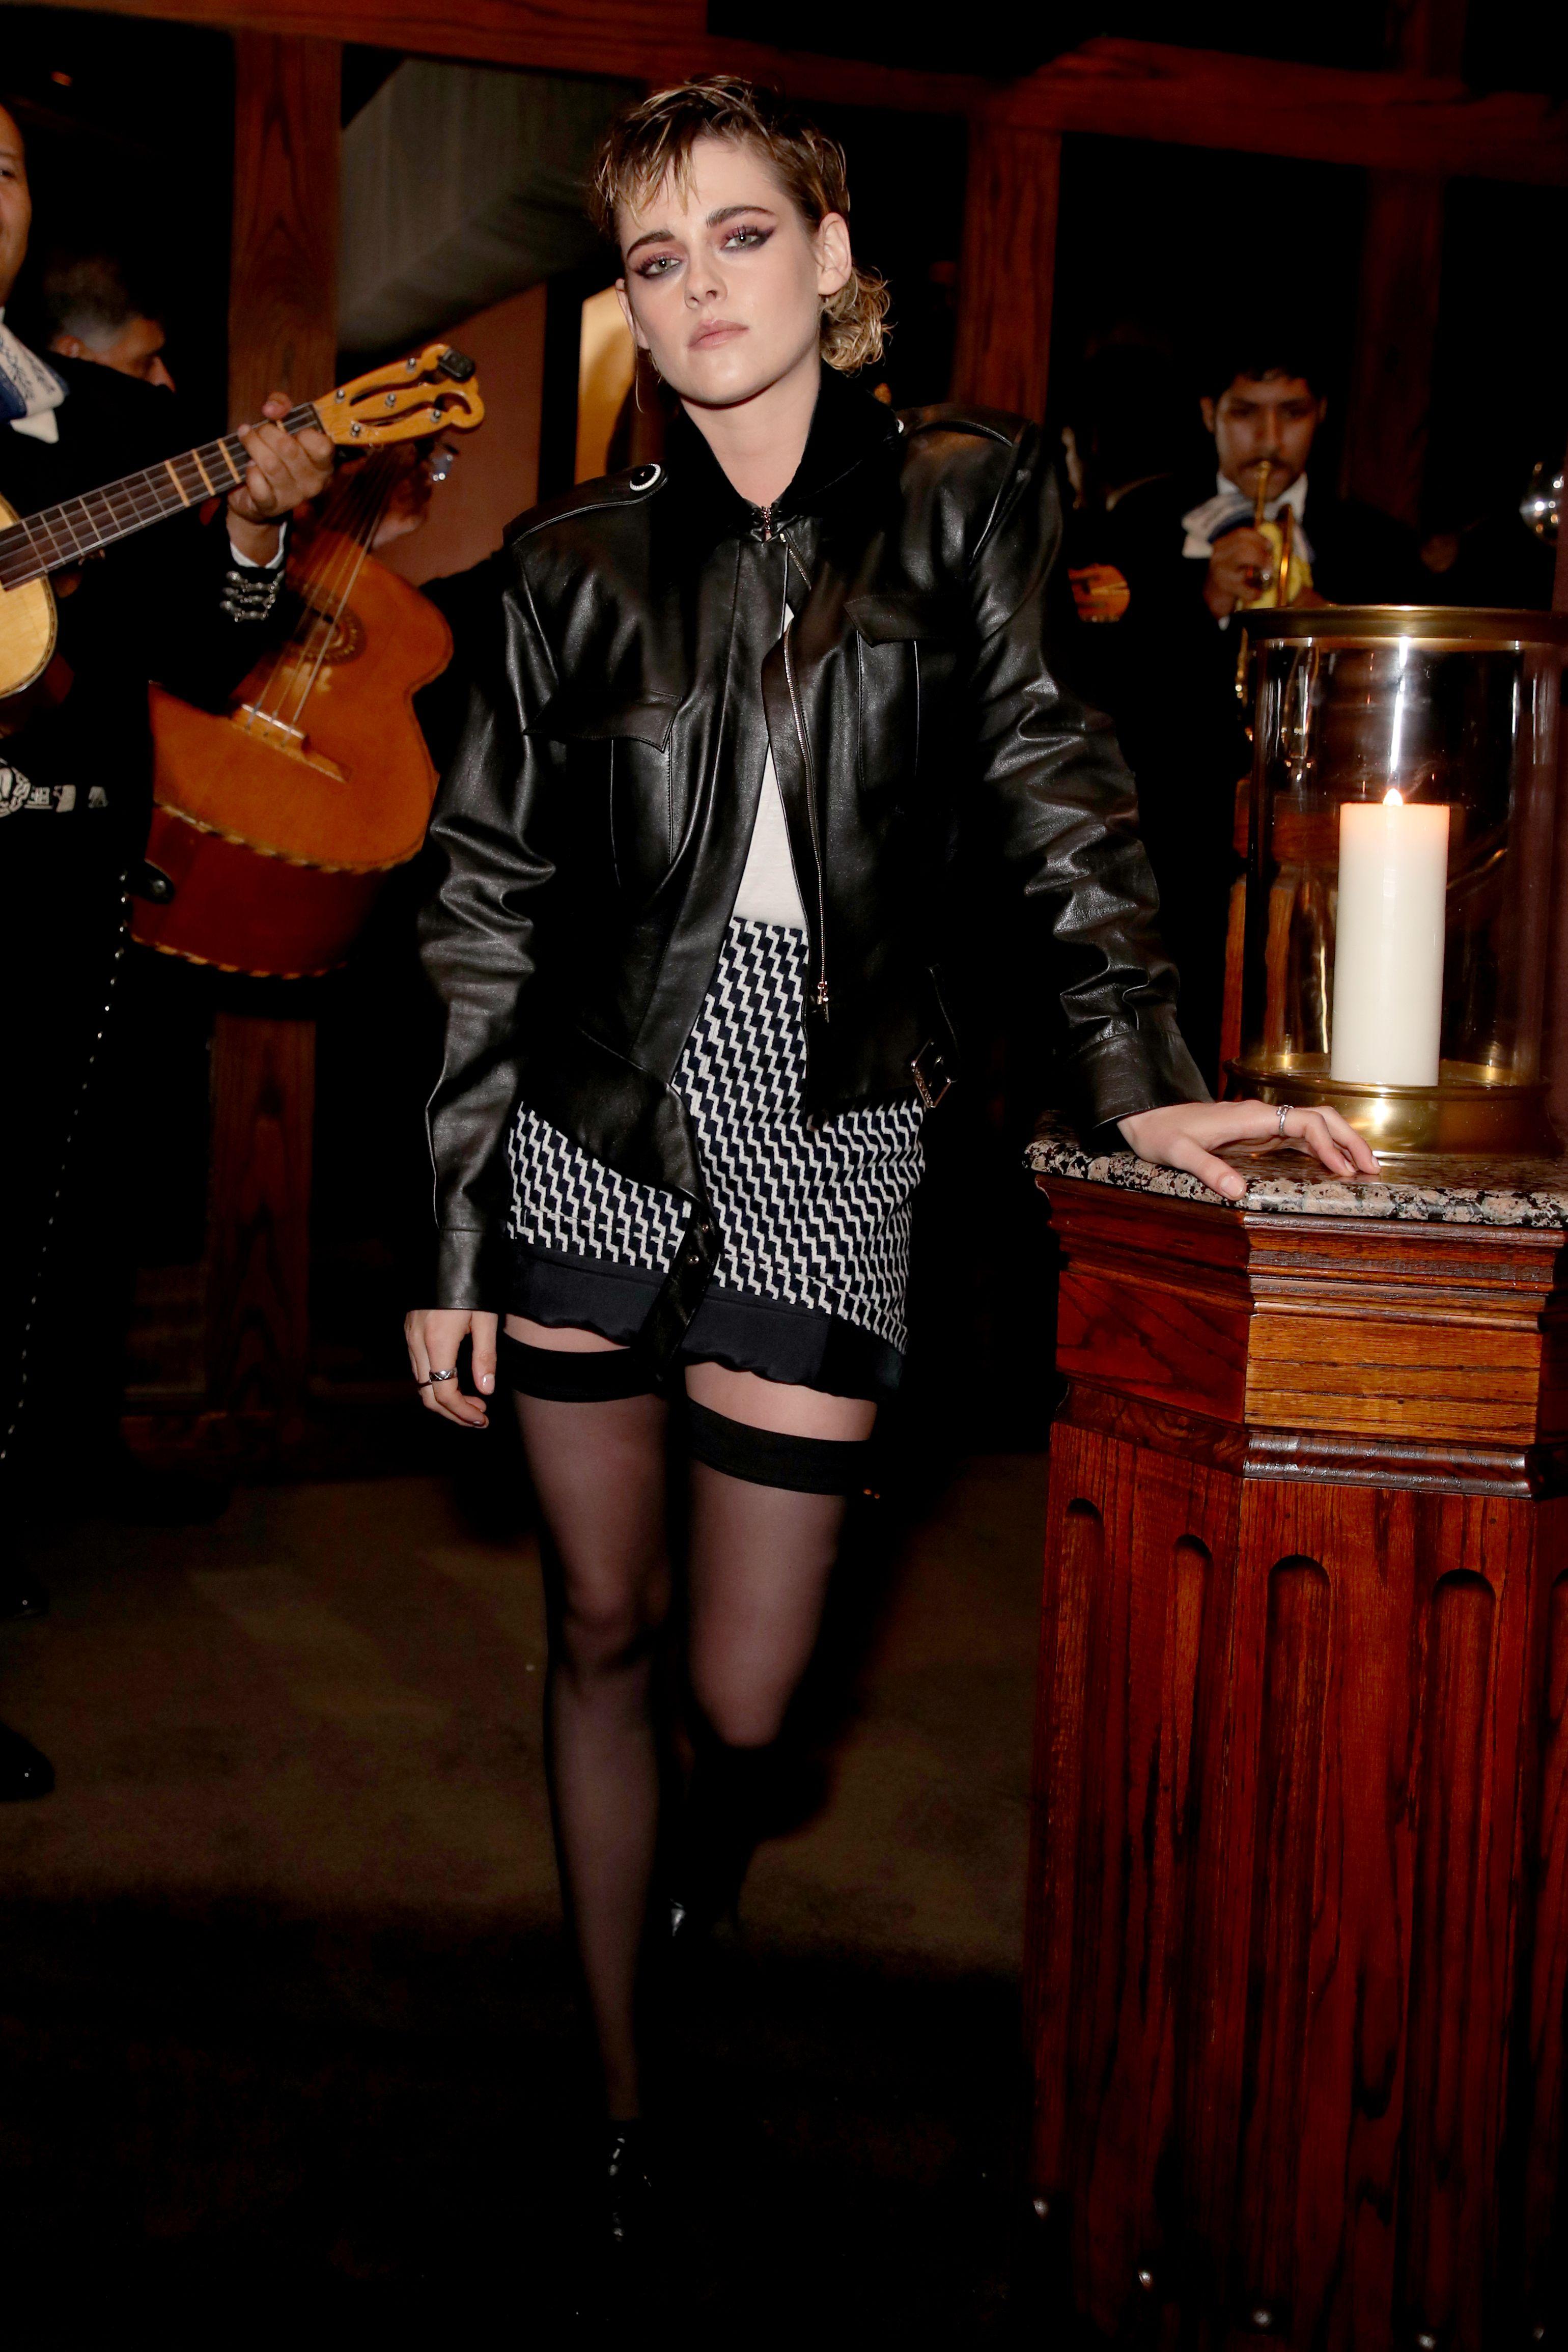 Kristen StewartChanel and Charles Finch Pre-Oscar dinner, Inside, Los Angeles, USA 03 Mar 2018